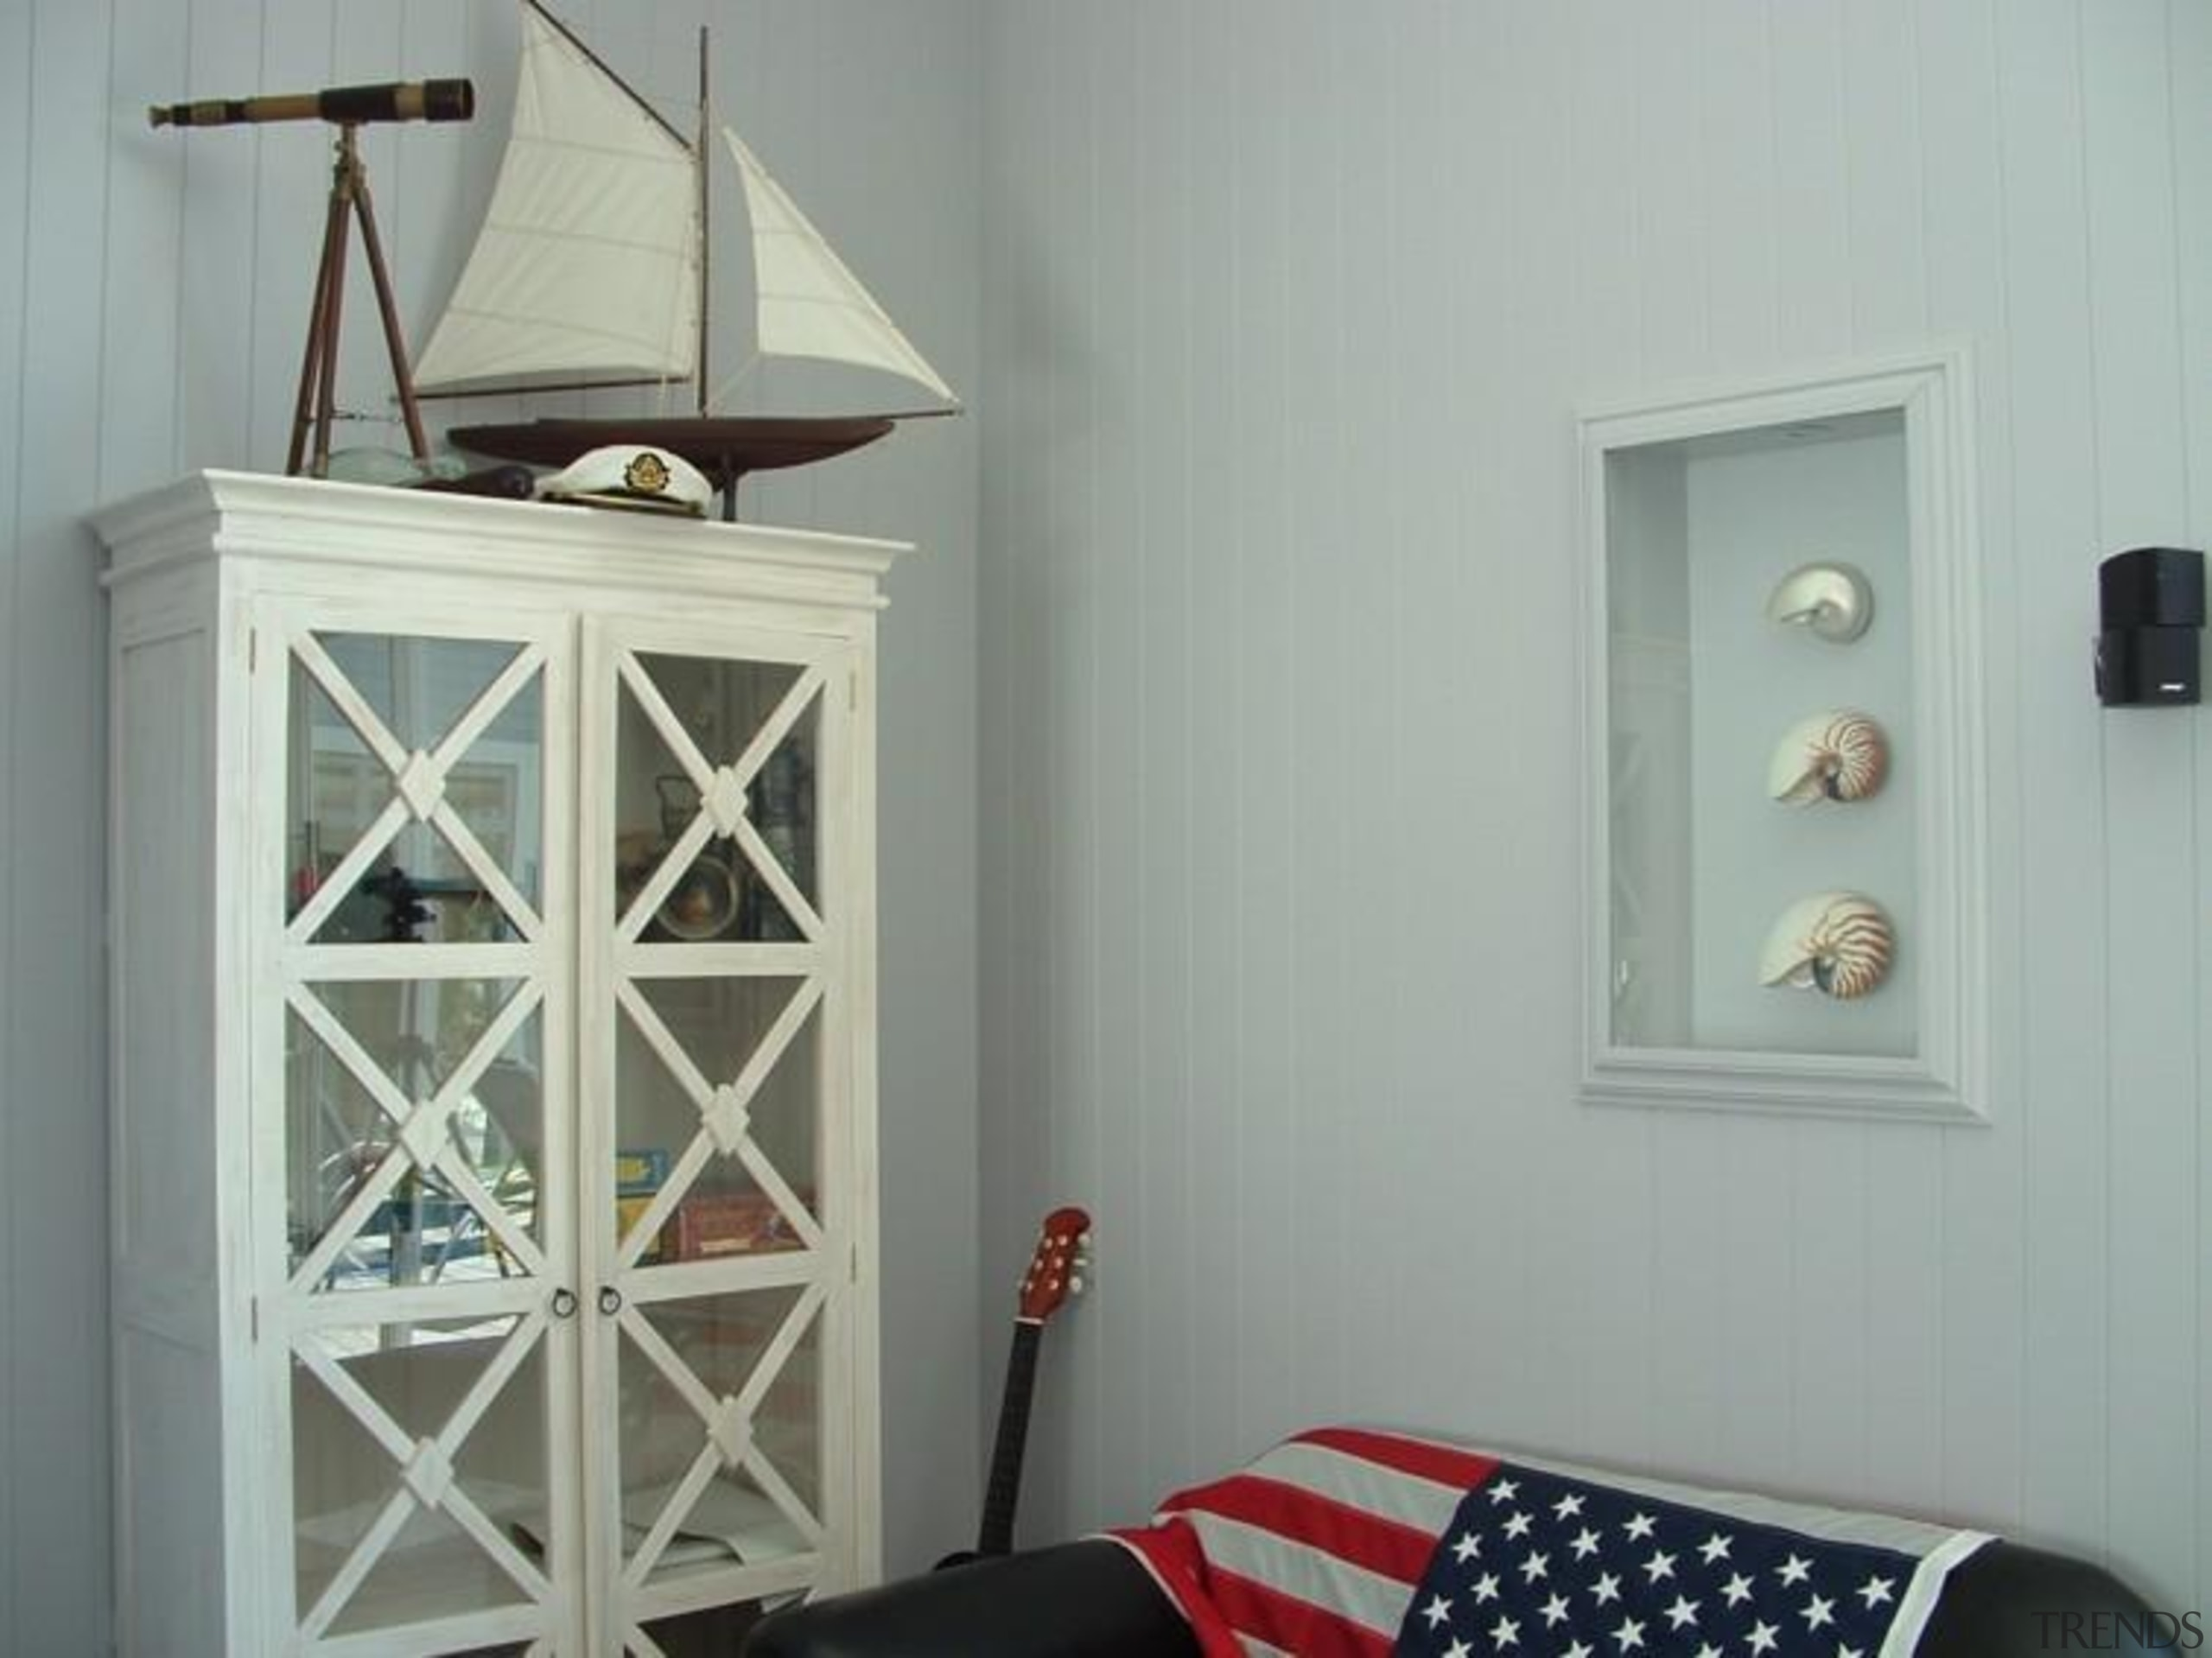 Longbeach Home 5 - furniture | home | furniture, home, interior design, light fixture, room, shelf, shelving, wall, gray